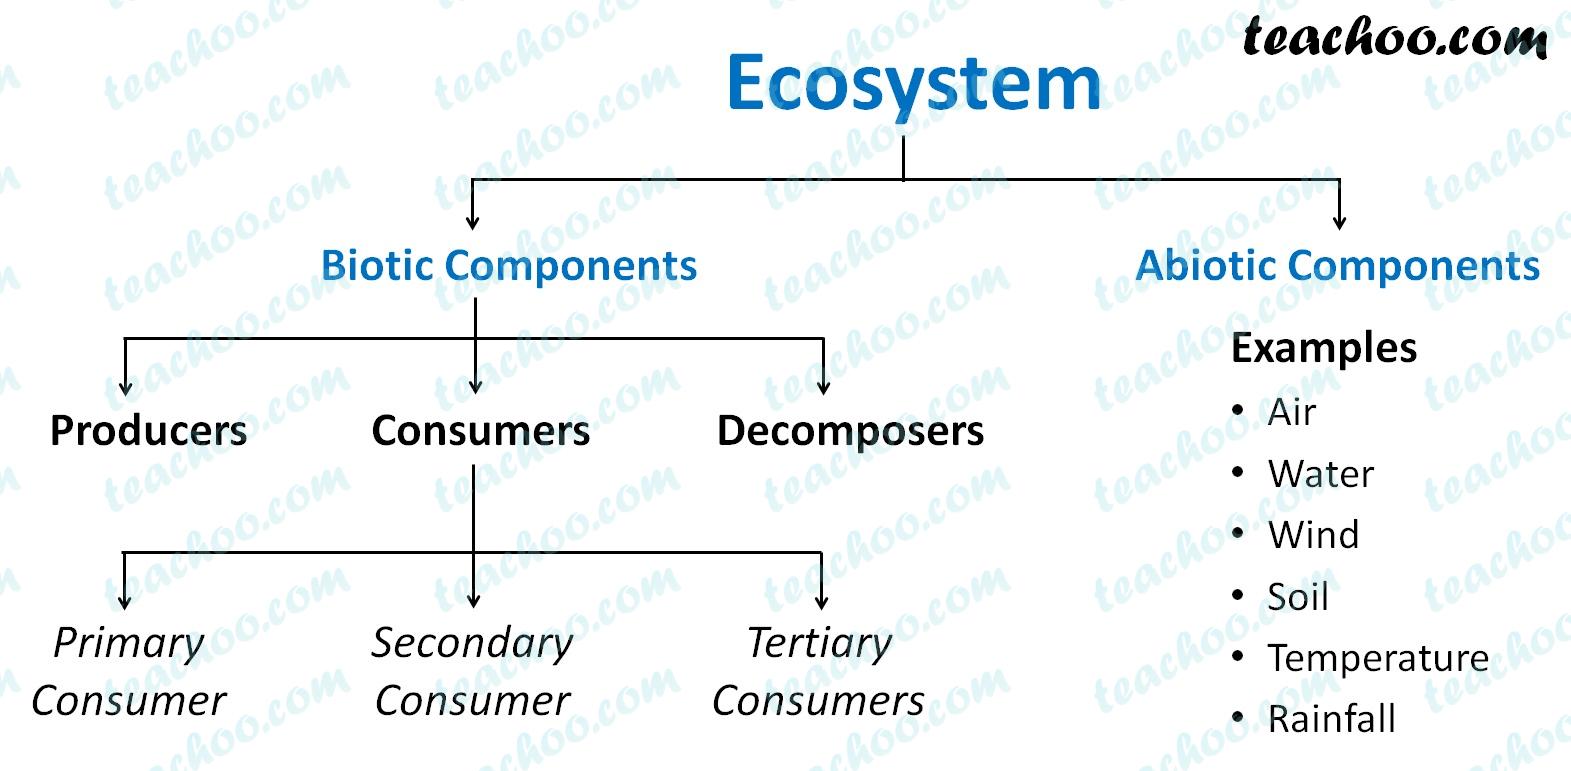 components-of-an-ecosystem---teachoo.jpg